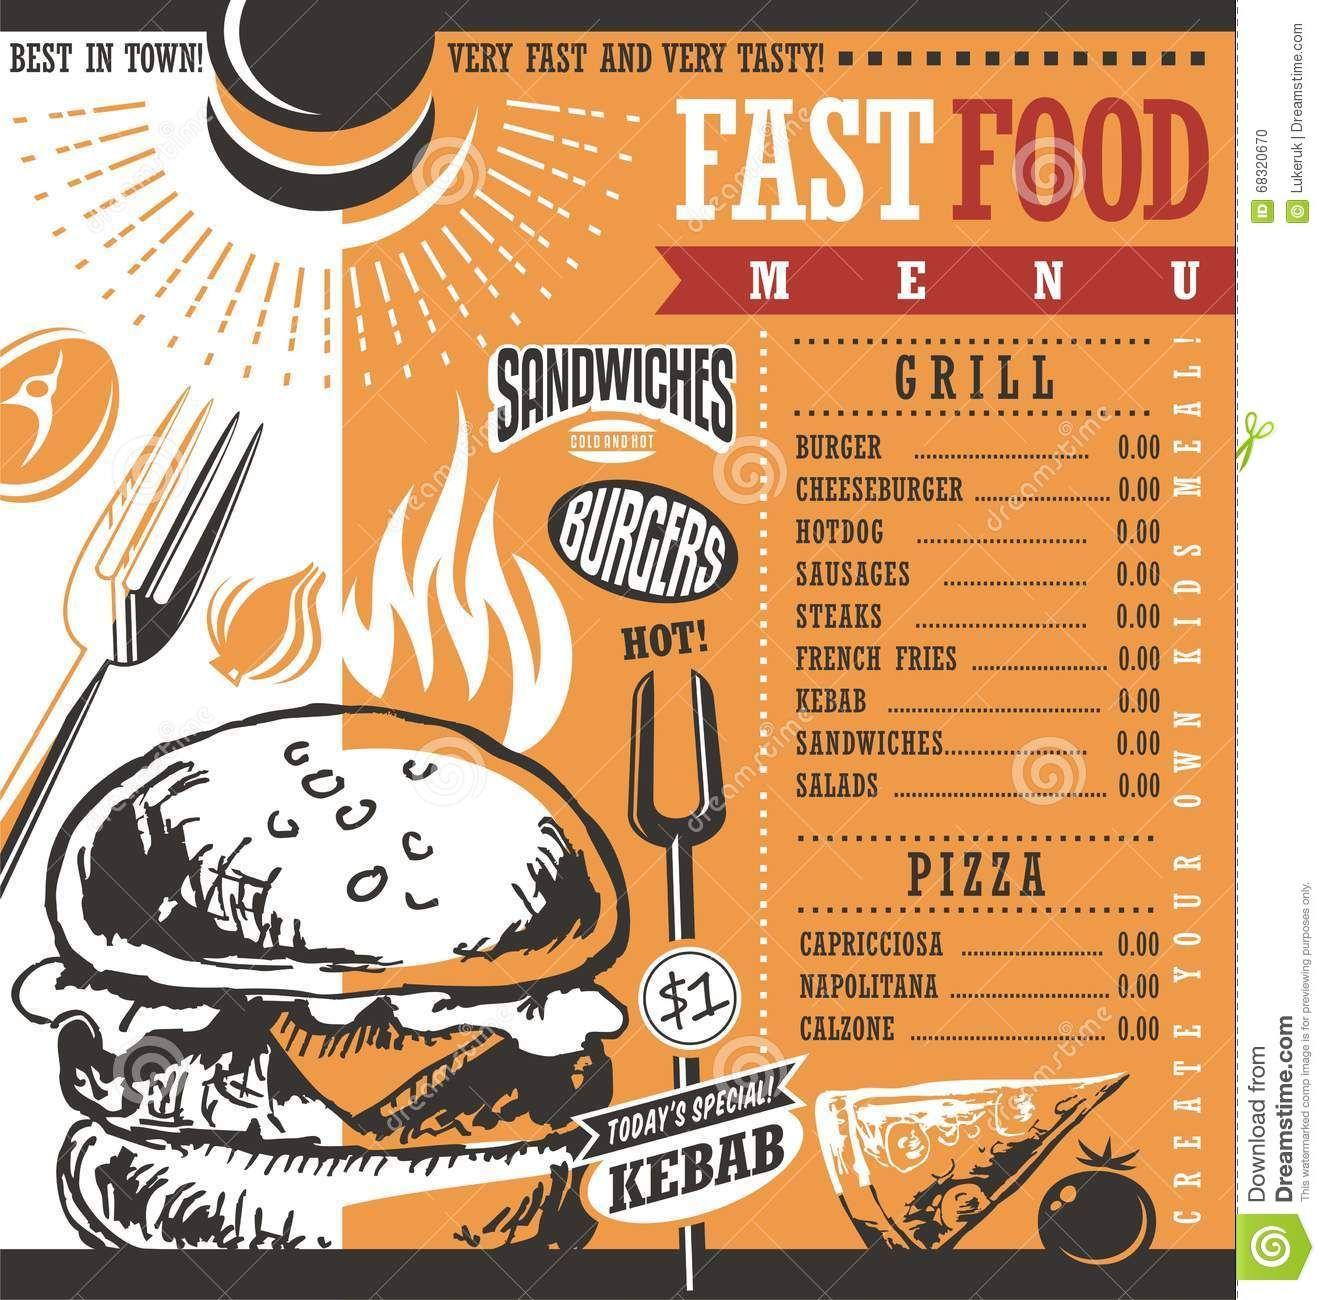 FastFoodRestaurantMenuDesignIdeaVintageDrawingRetroPrice